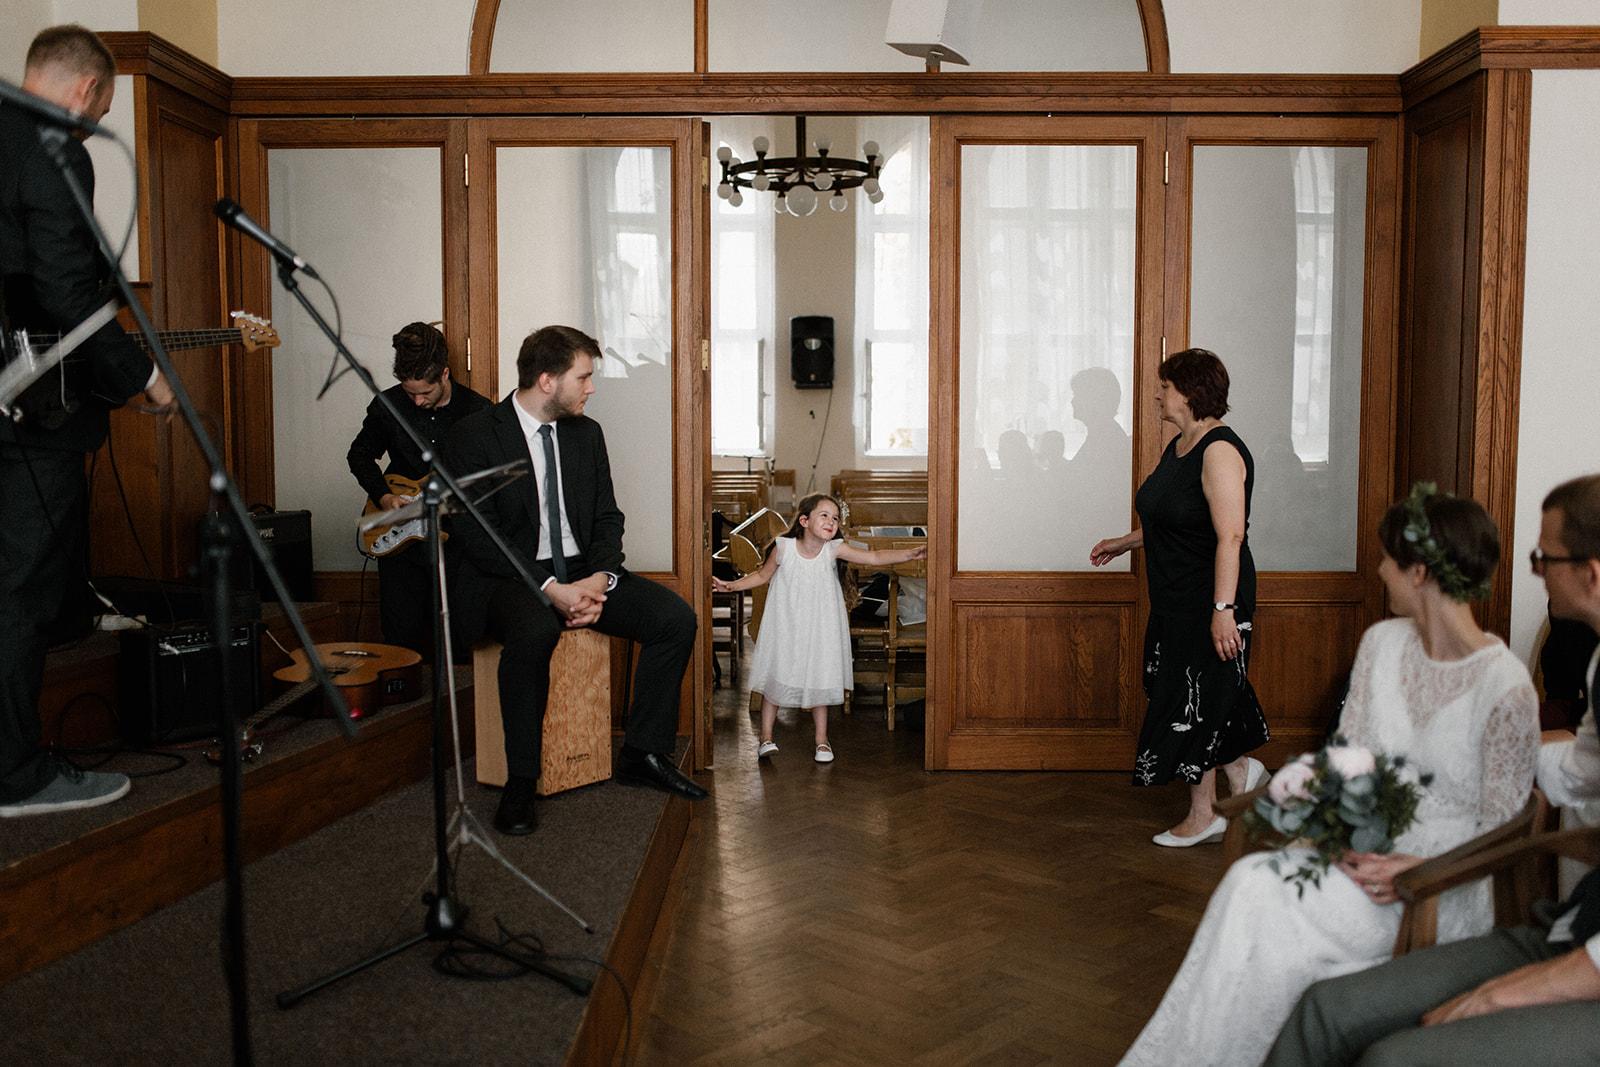 Jaja_Josh_wedding-215.jpg